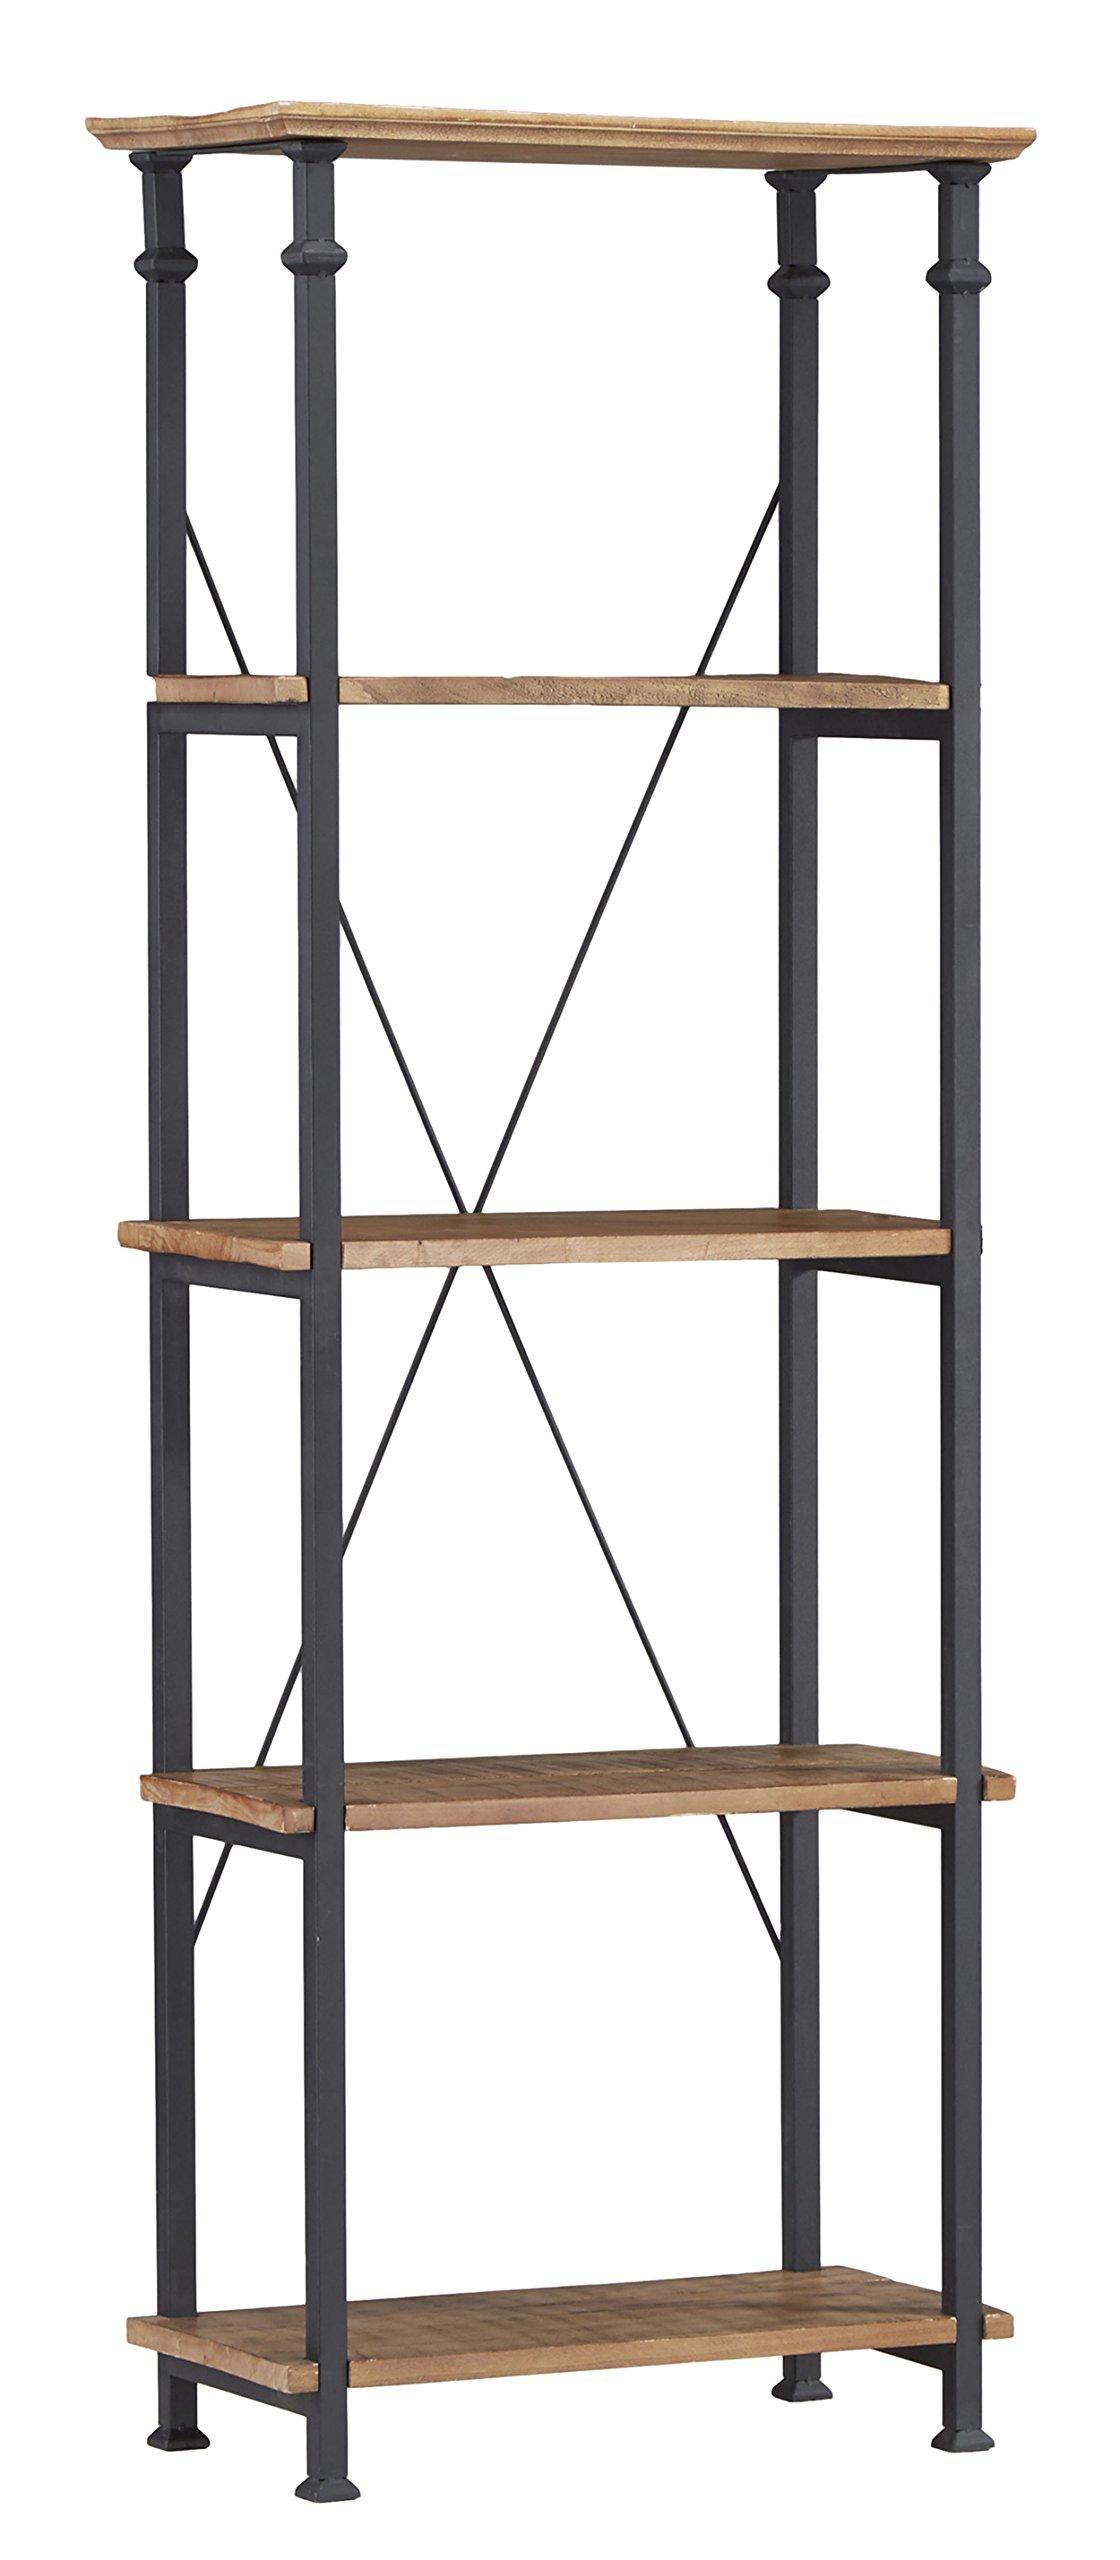 Homelegance Factory Modern Industrial Style Sofa Table, Rustic Brown 3